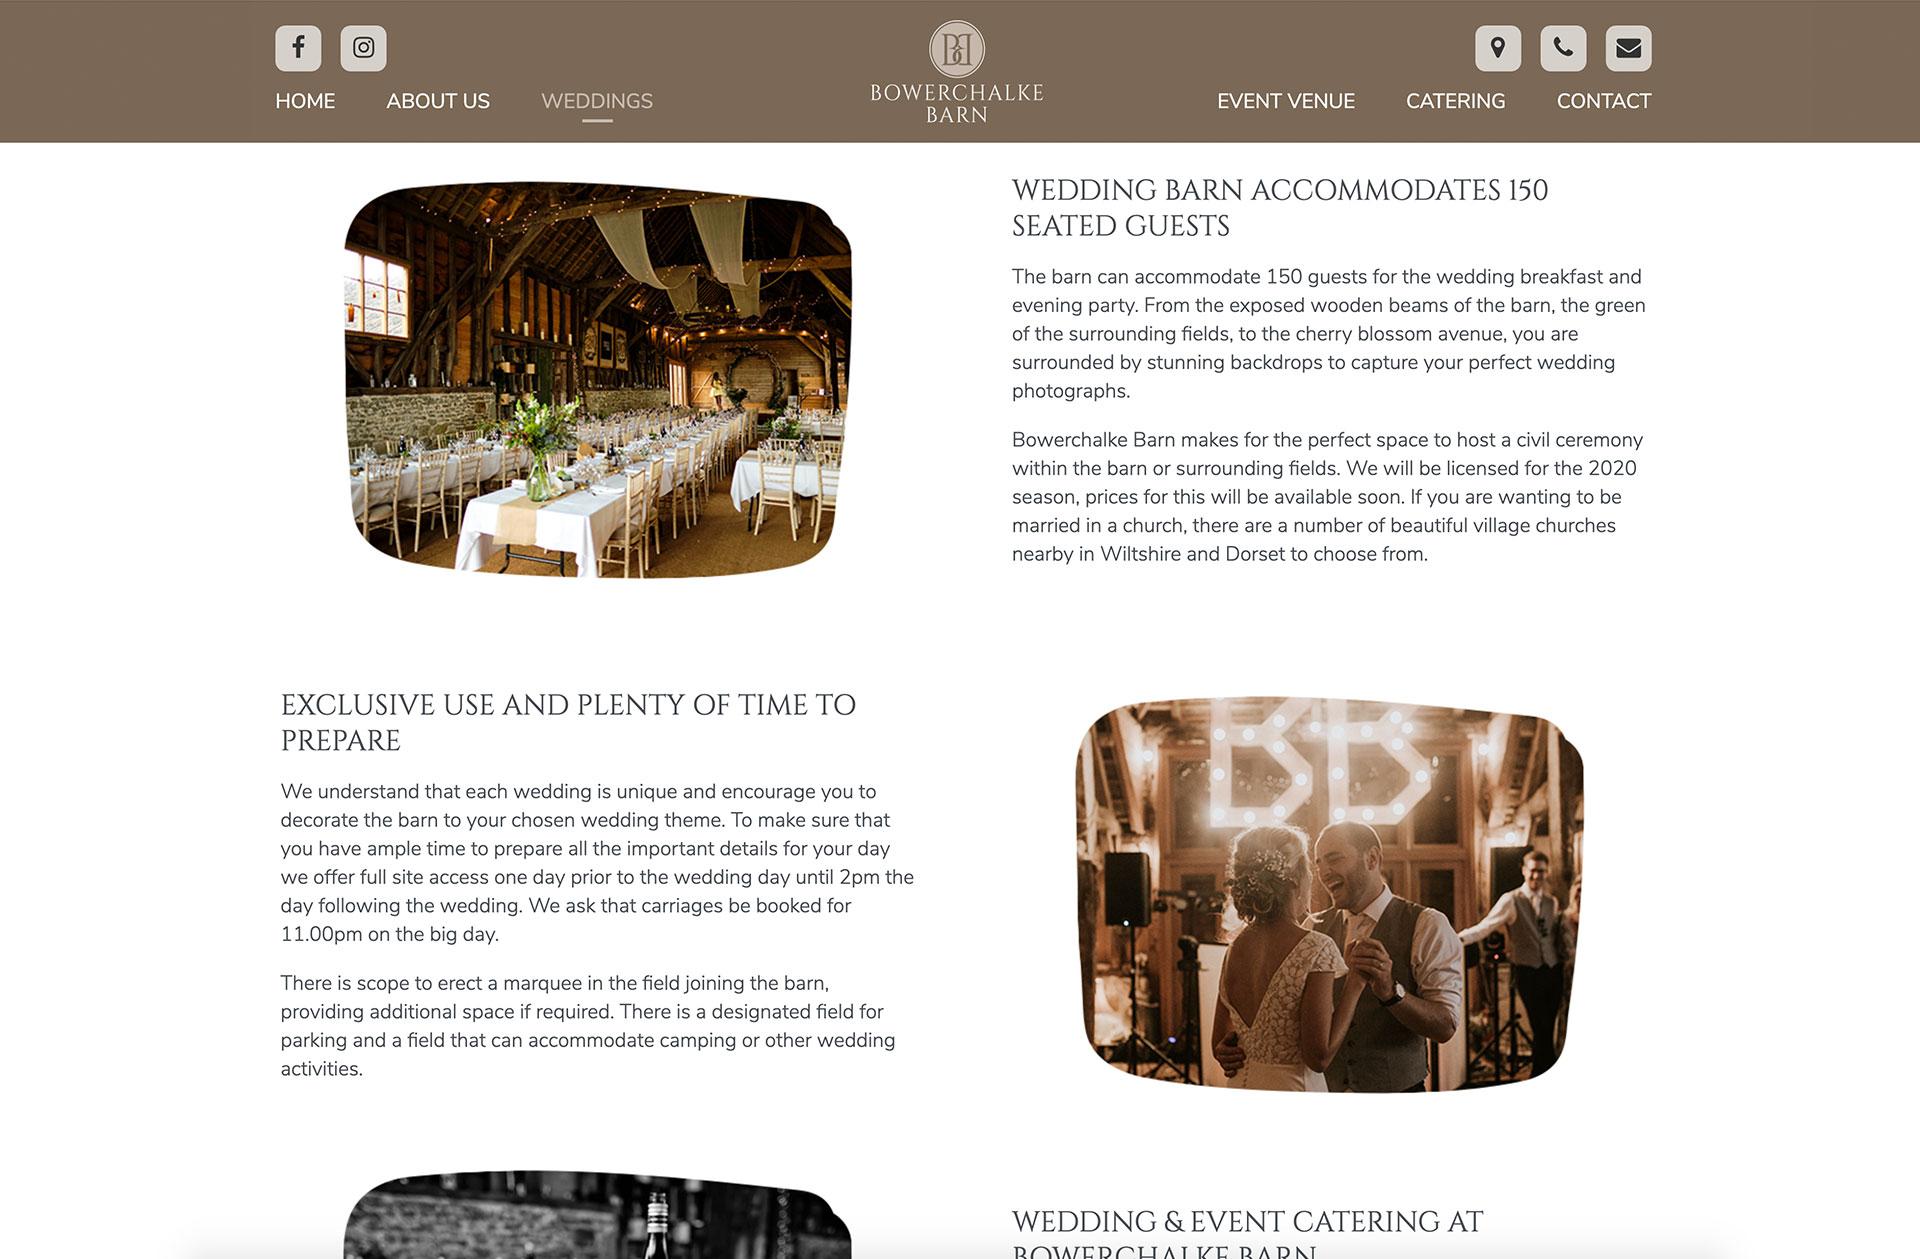 Bowerchalke Barn content columns